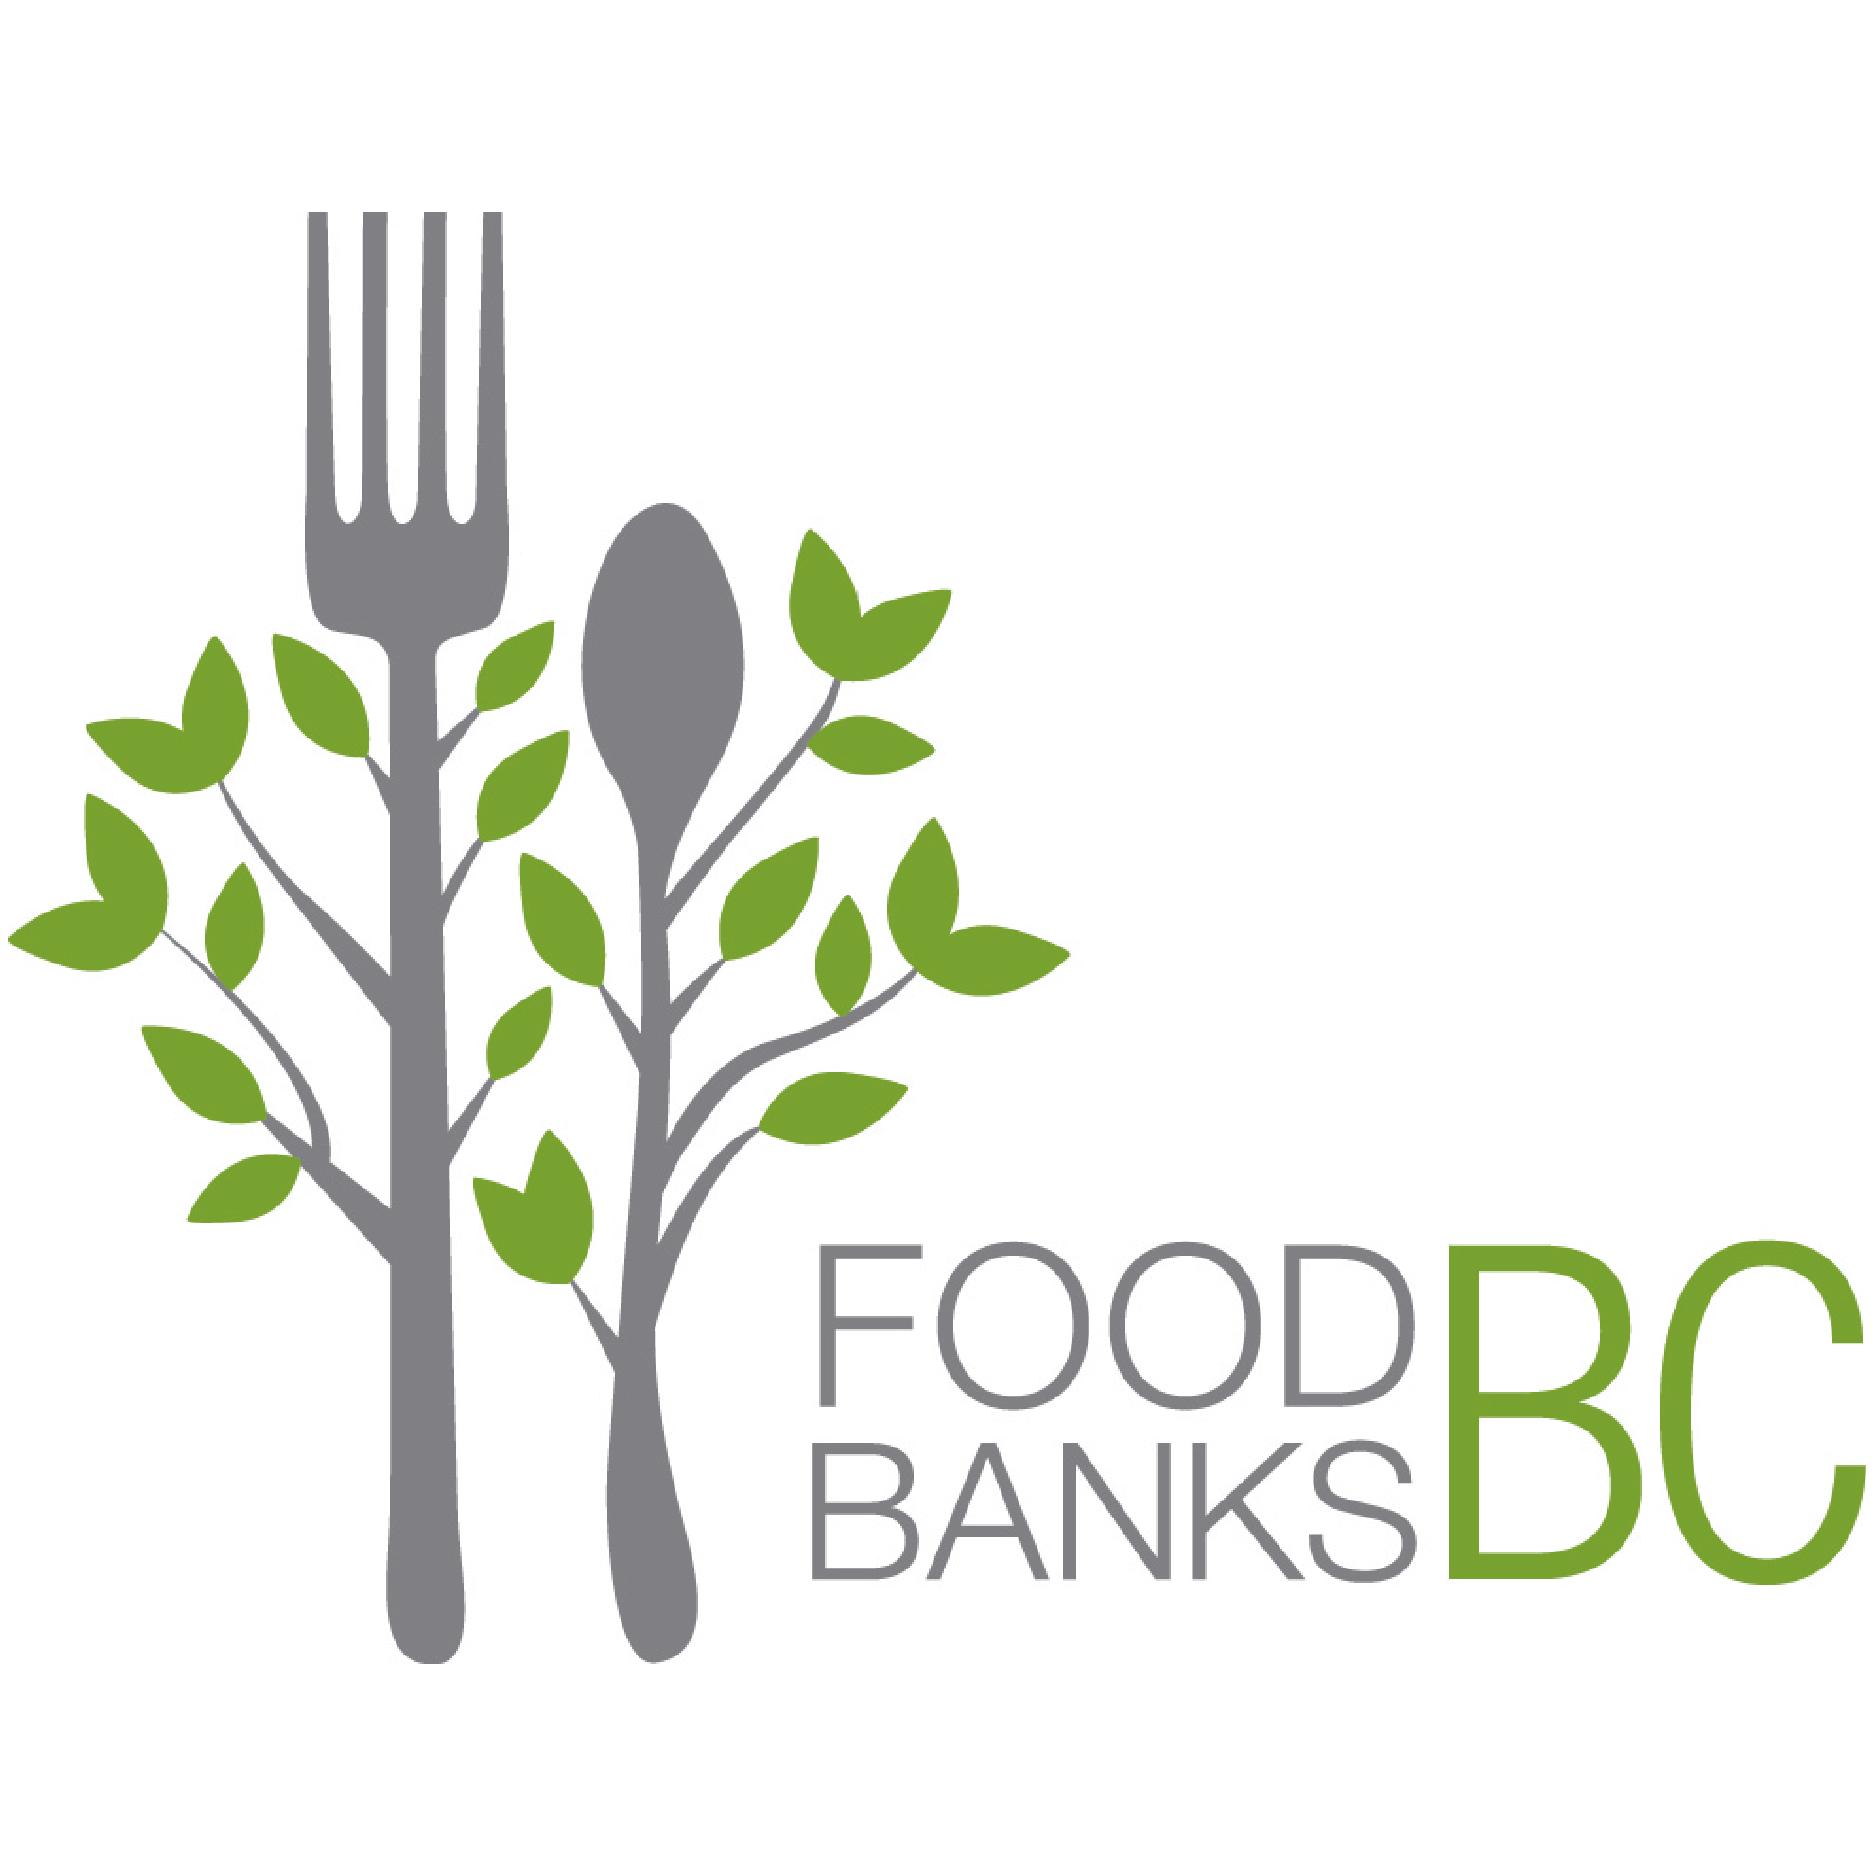 Emergency Food Purchasing Program - Account Set Up